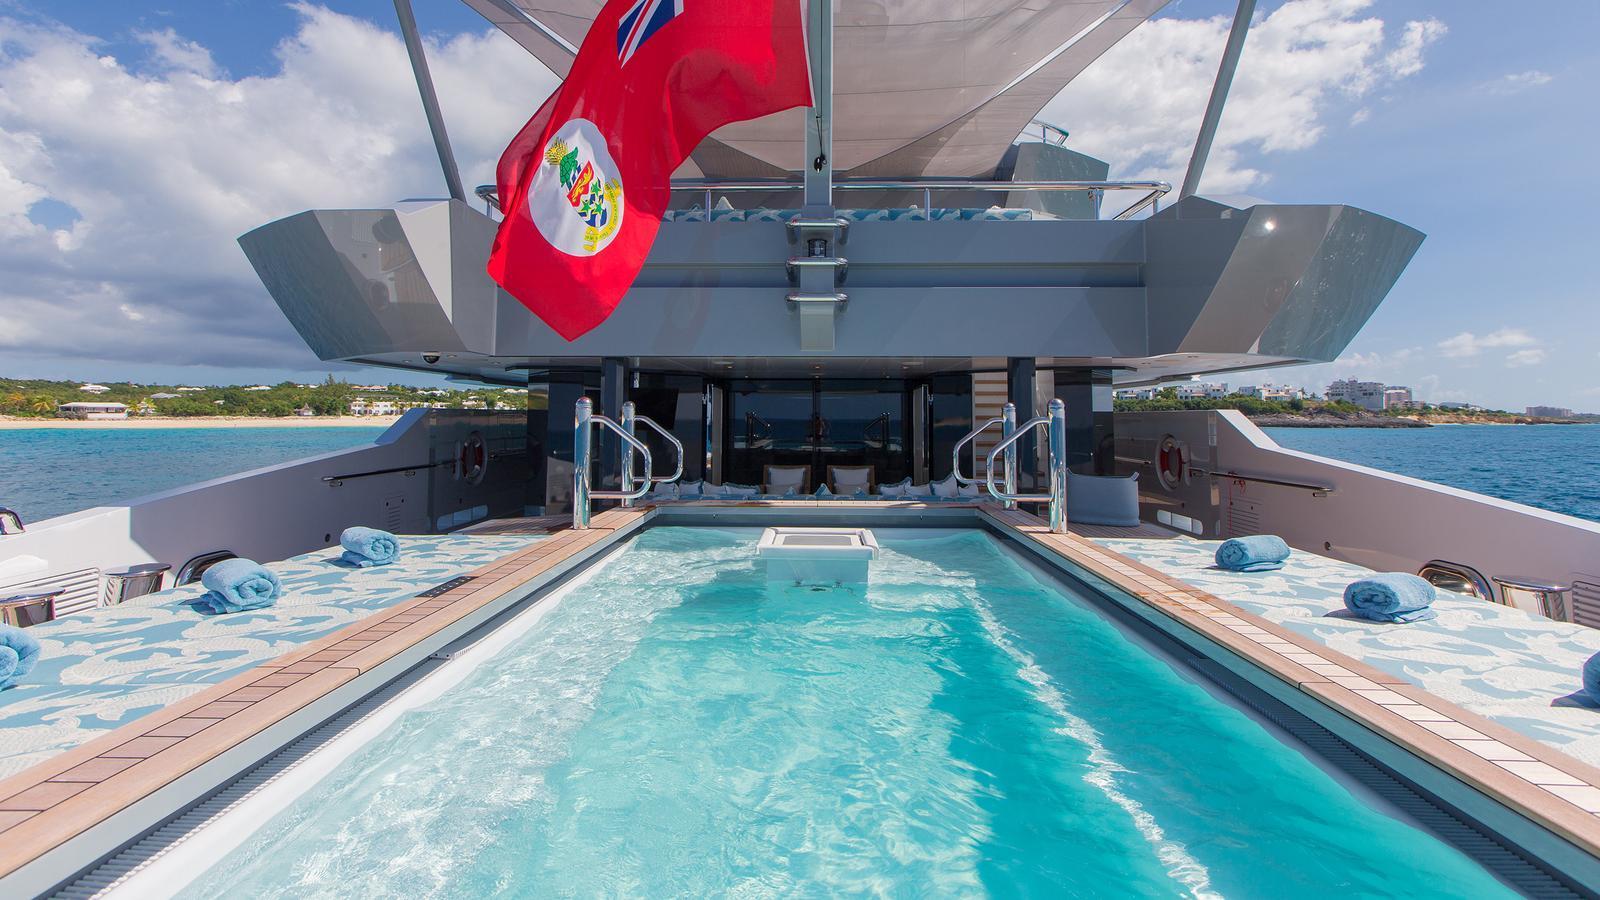 iroquois ester iii motor yacht lurssen 2014 66m swimming pool